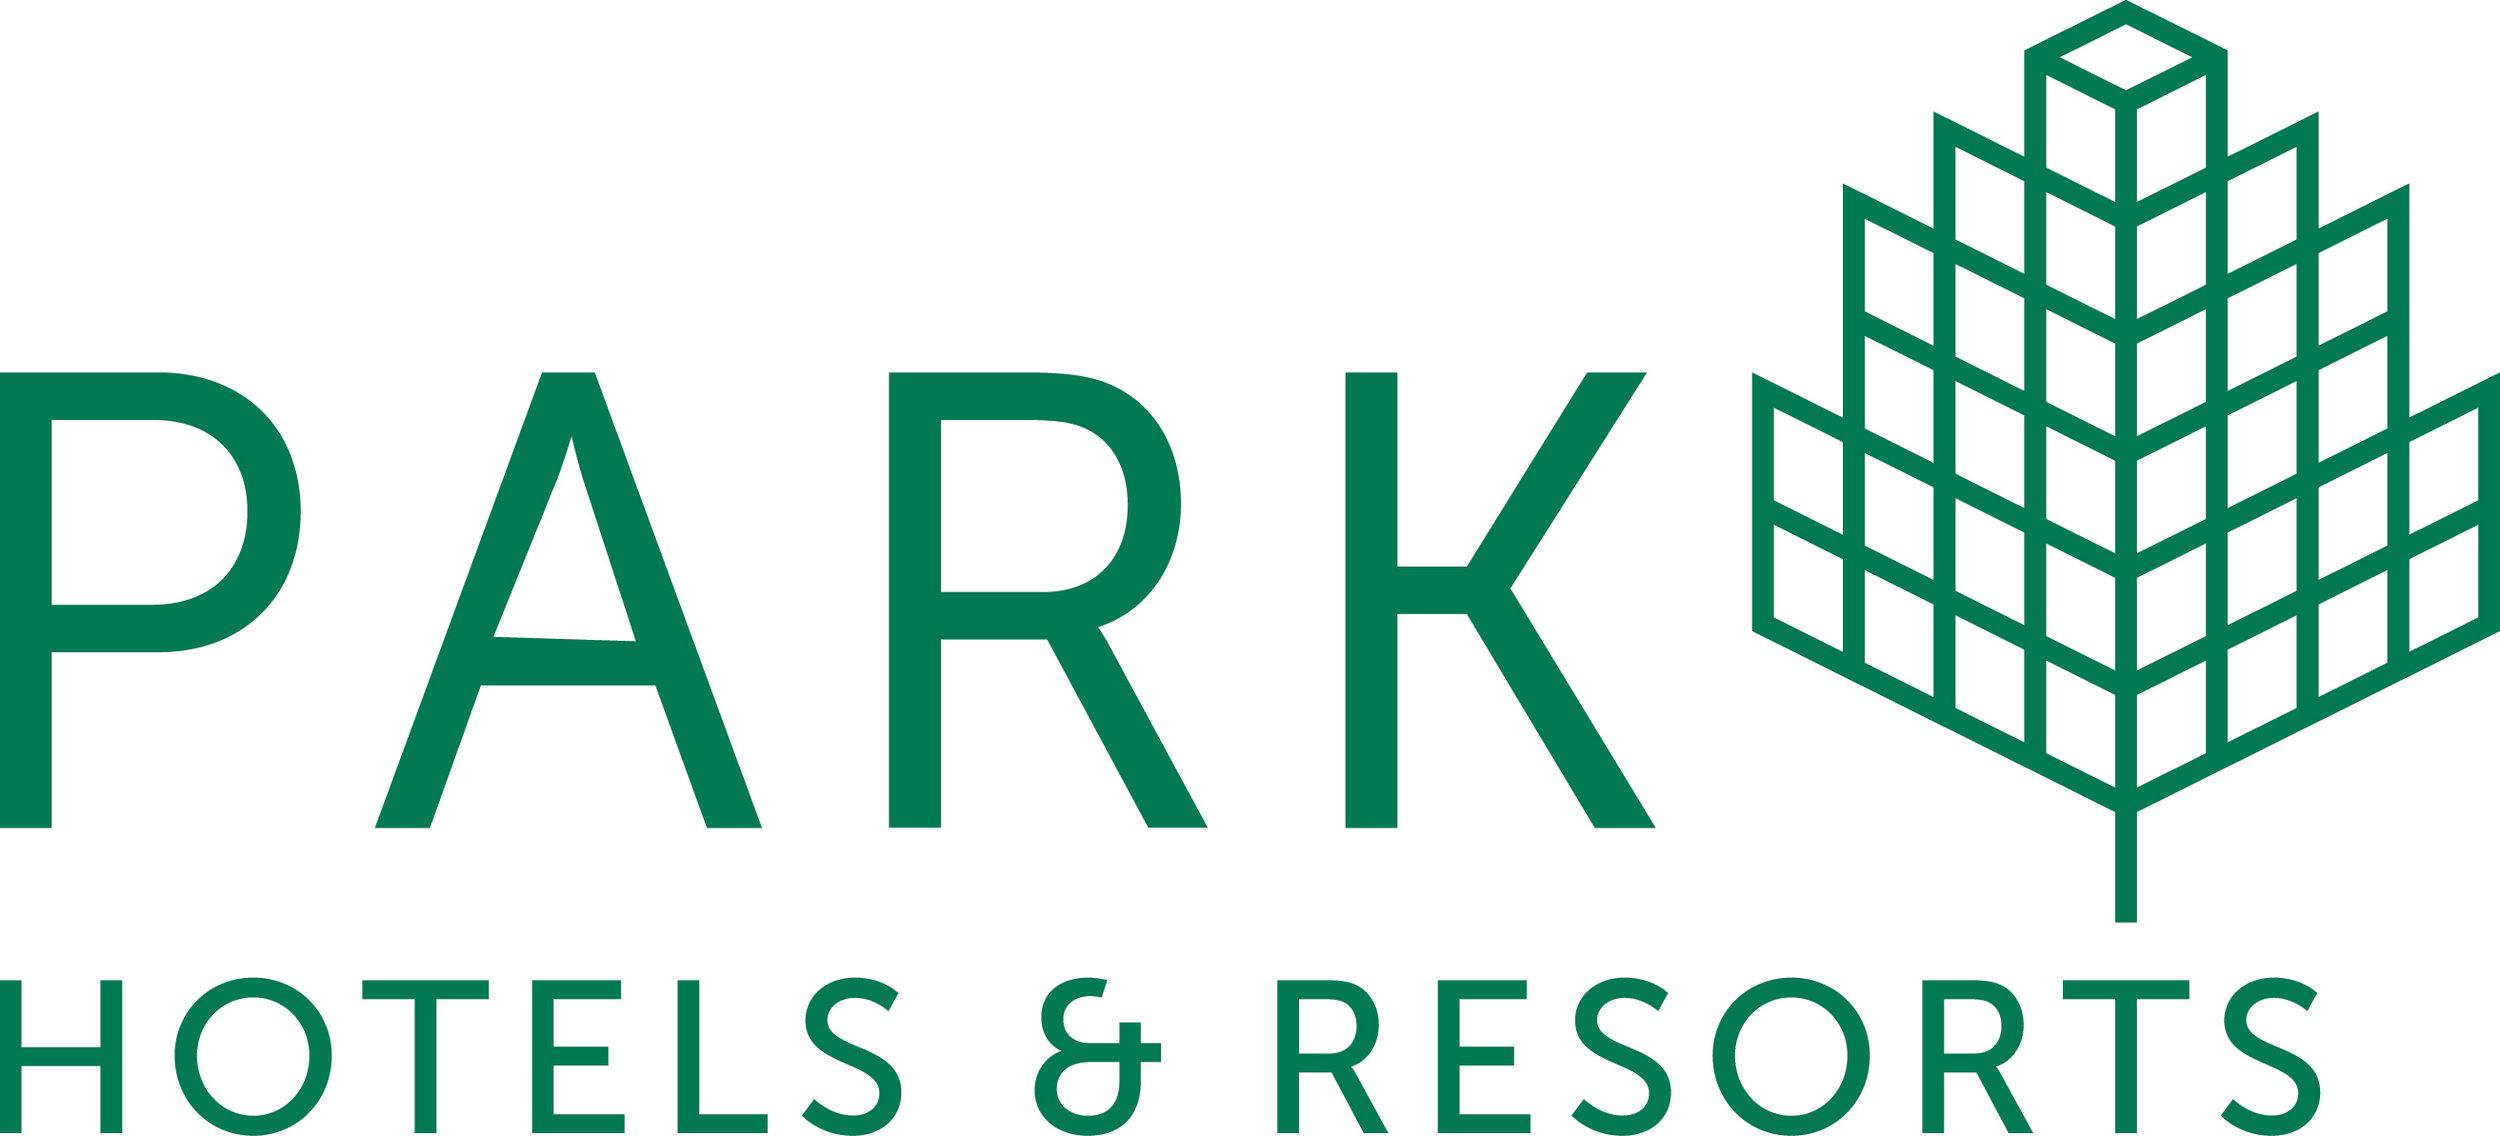 Park_Hotels_and resorts_logo.jpg